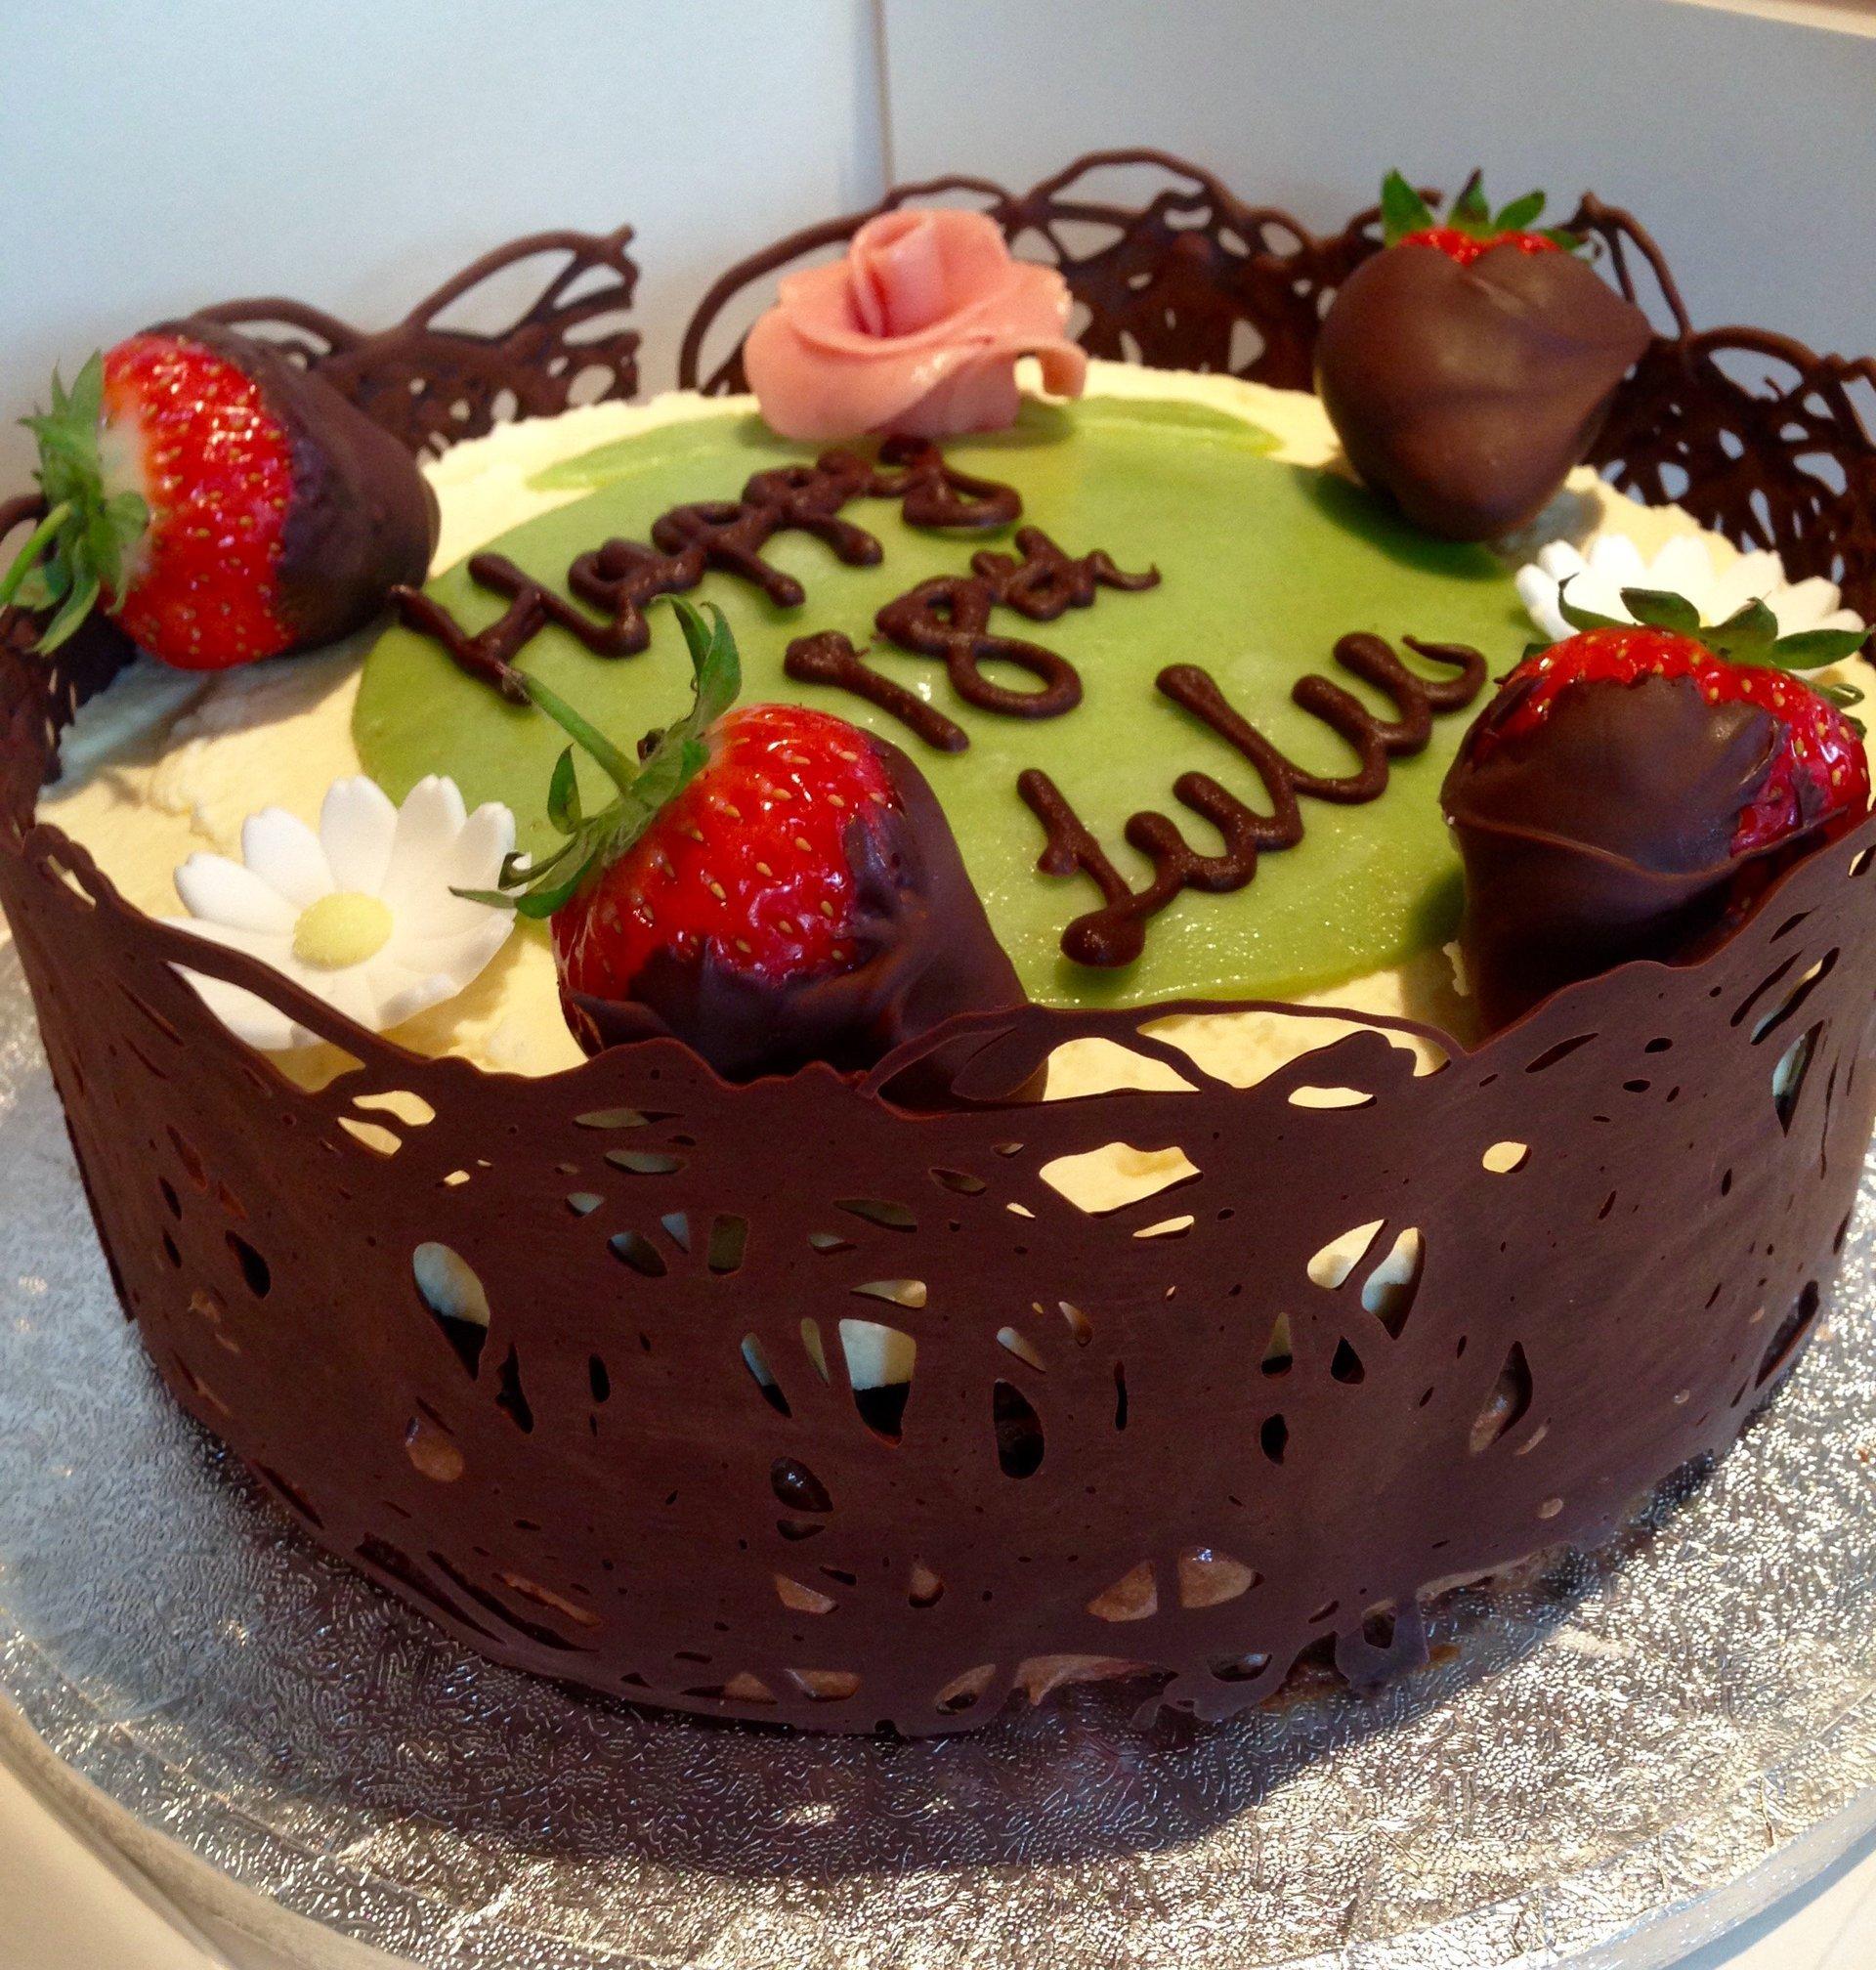 Cake Delivery In Tunbridge Wells And Tonbridge